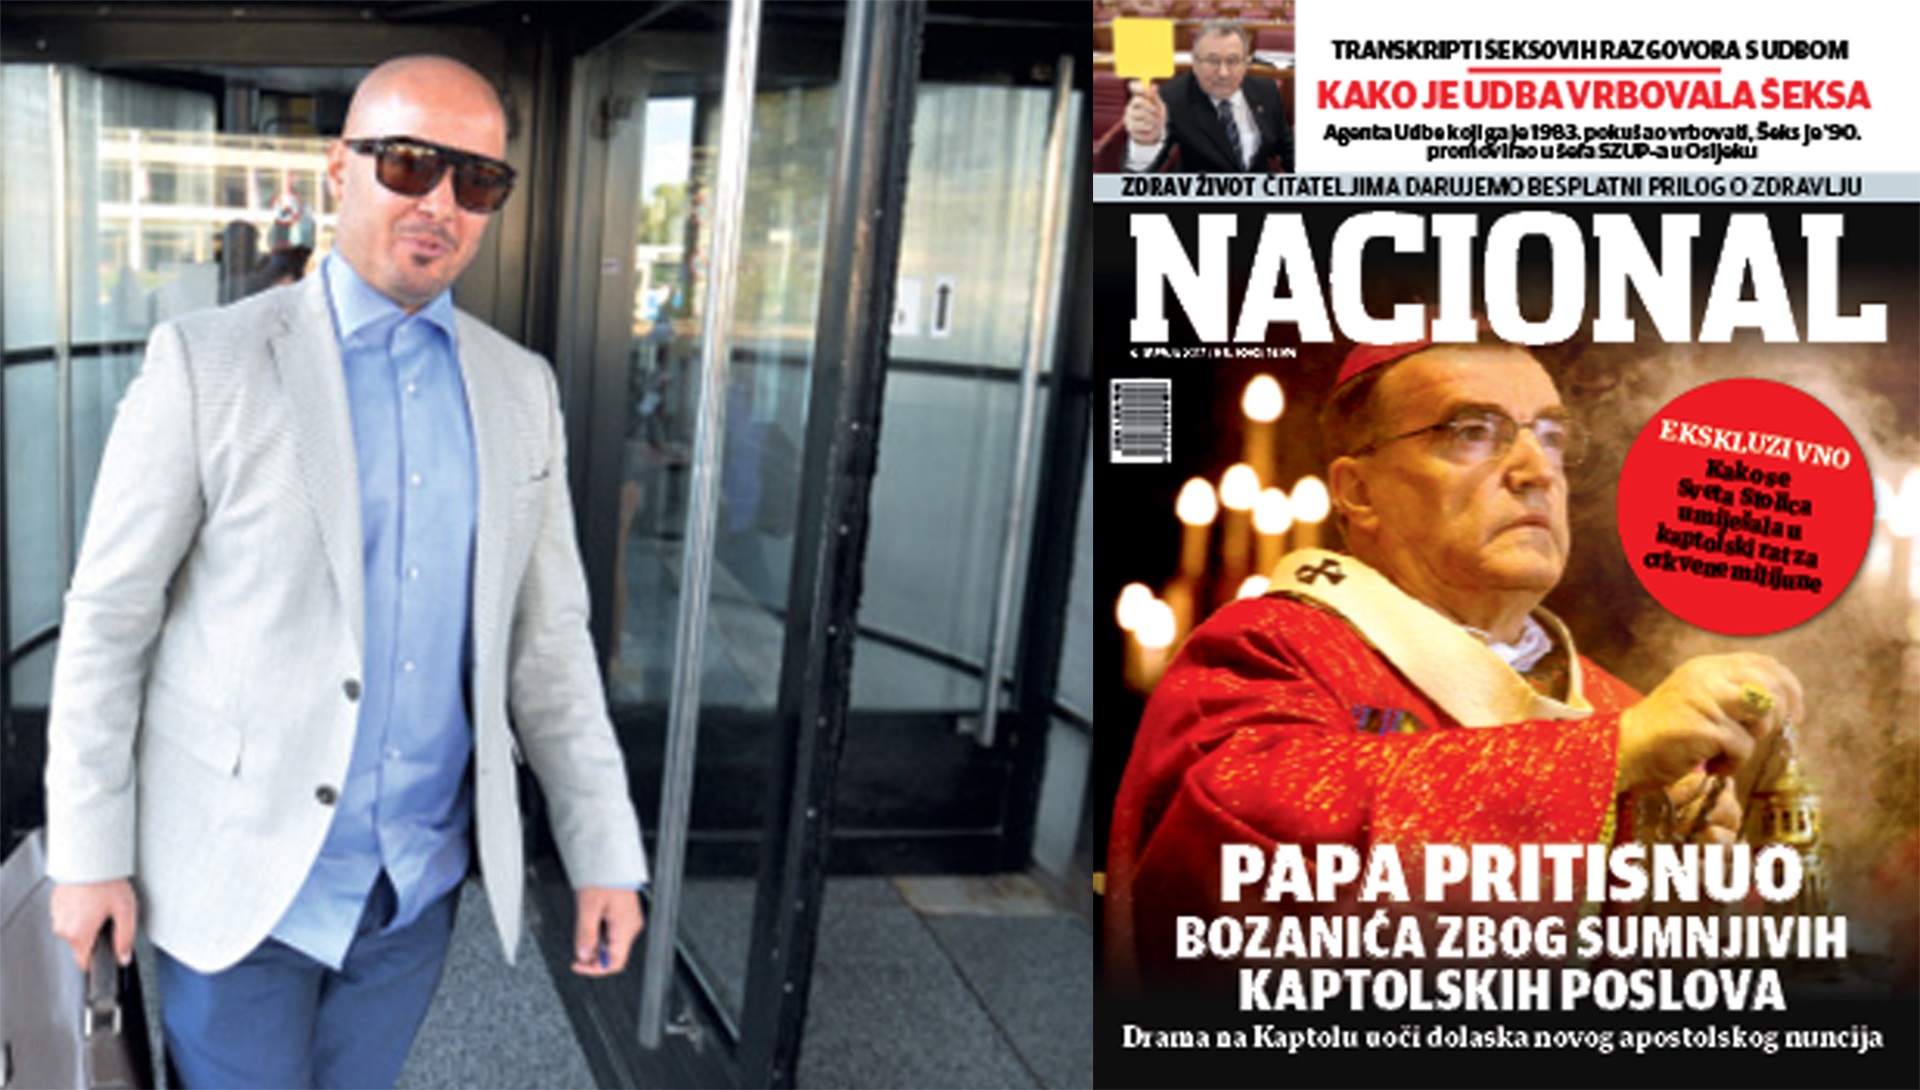 'Mijo Gabrić je pokušao iznuditi Daria Budimira'